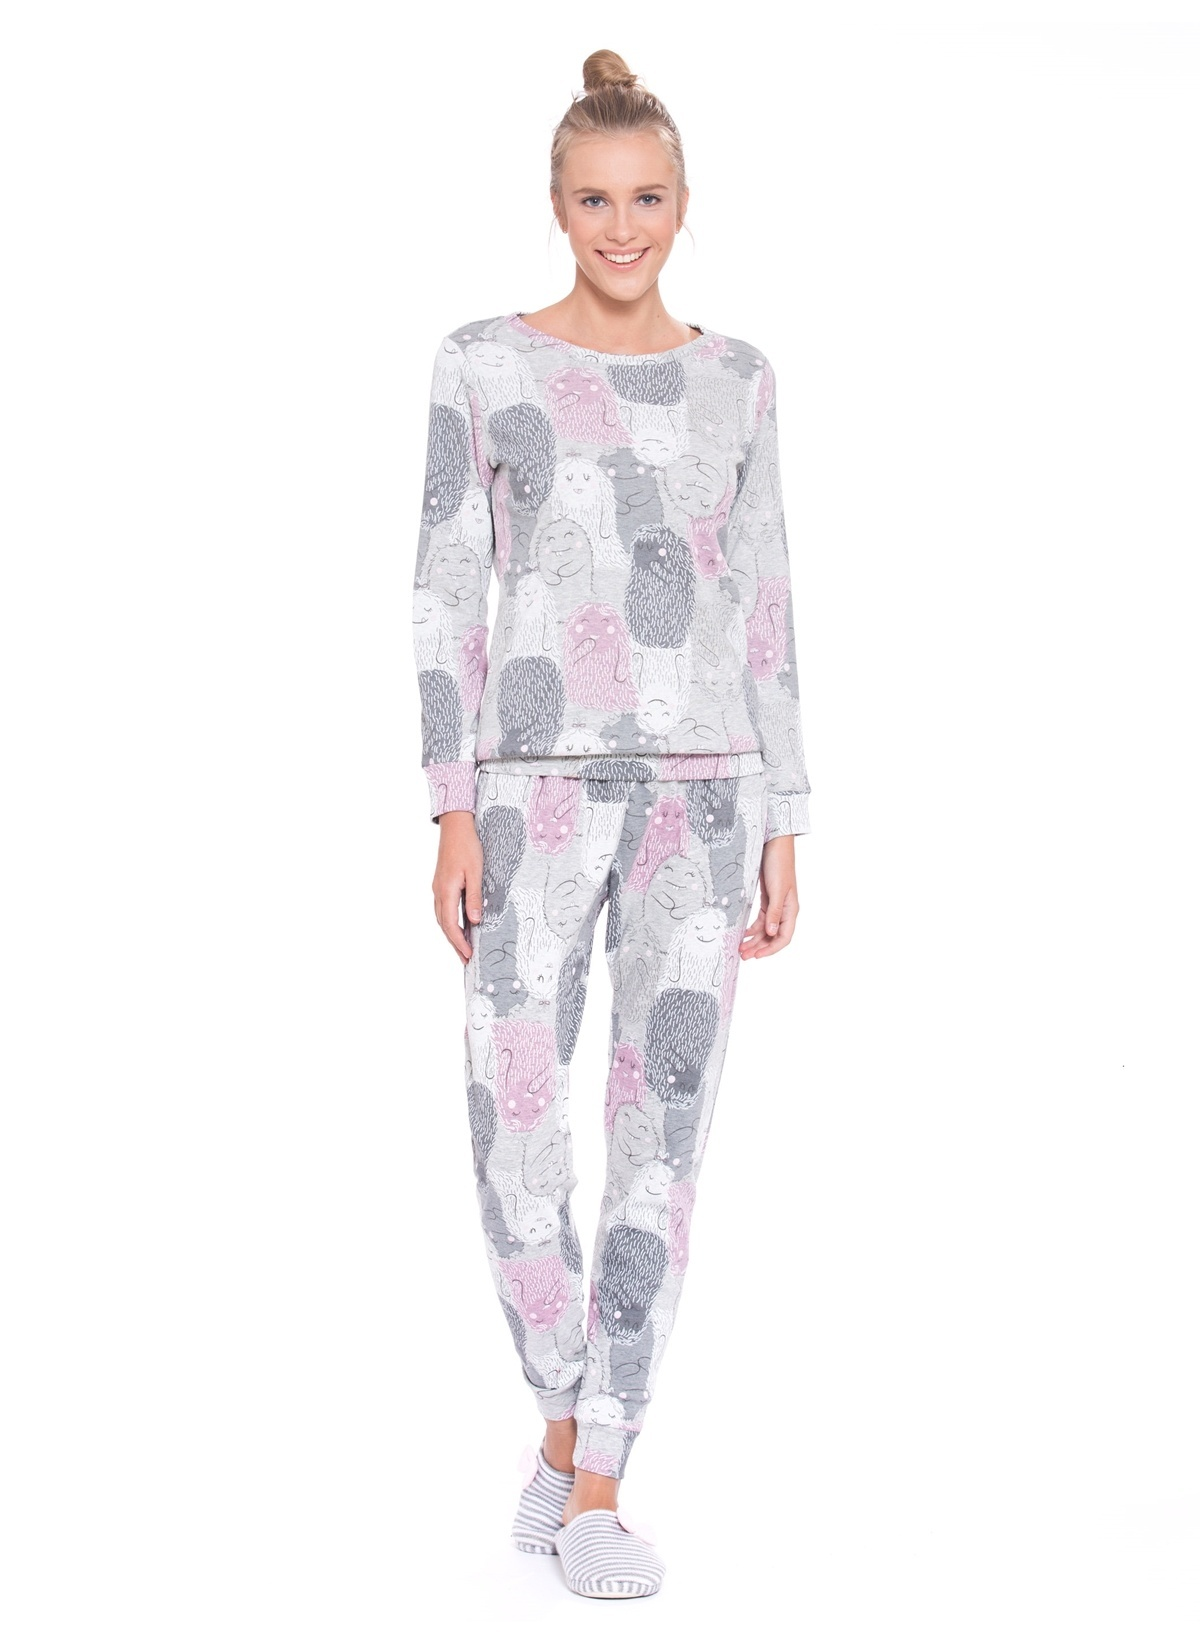 Lcw pijama takımı bayan